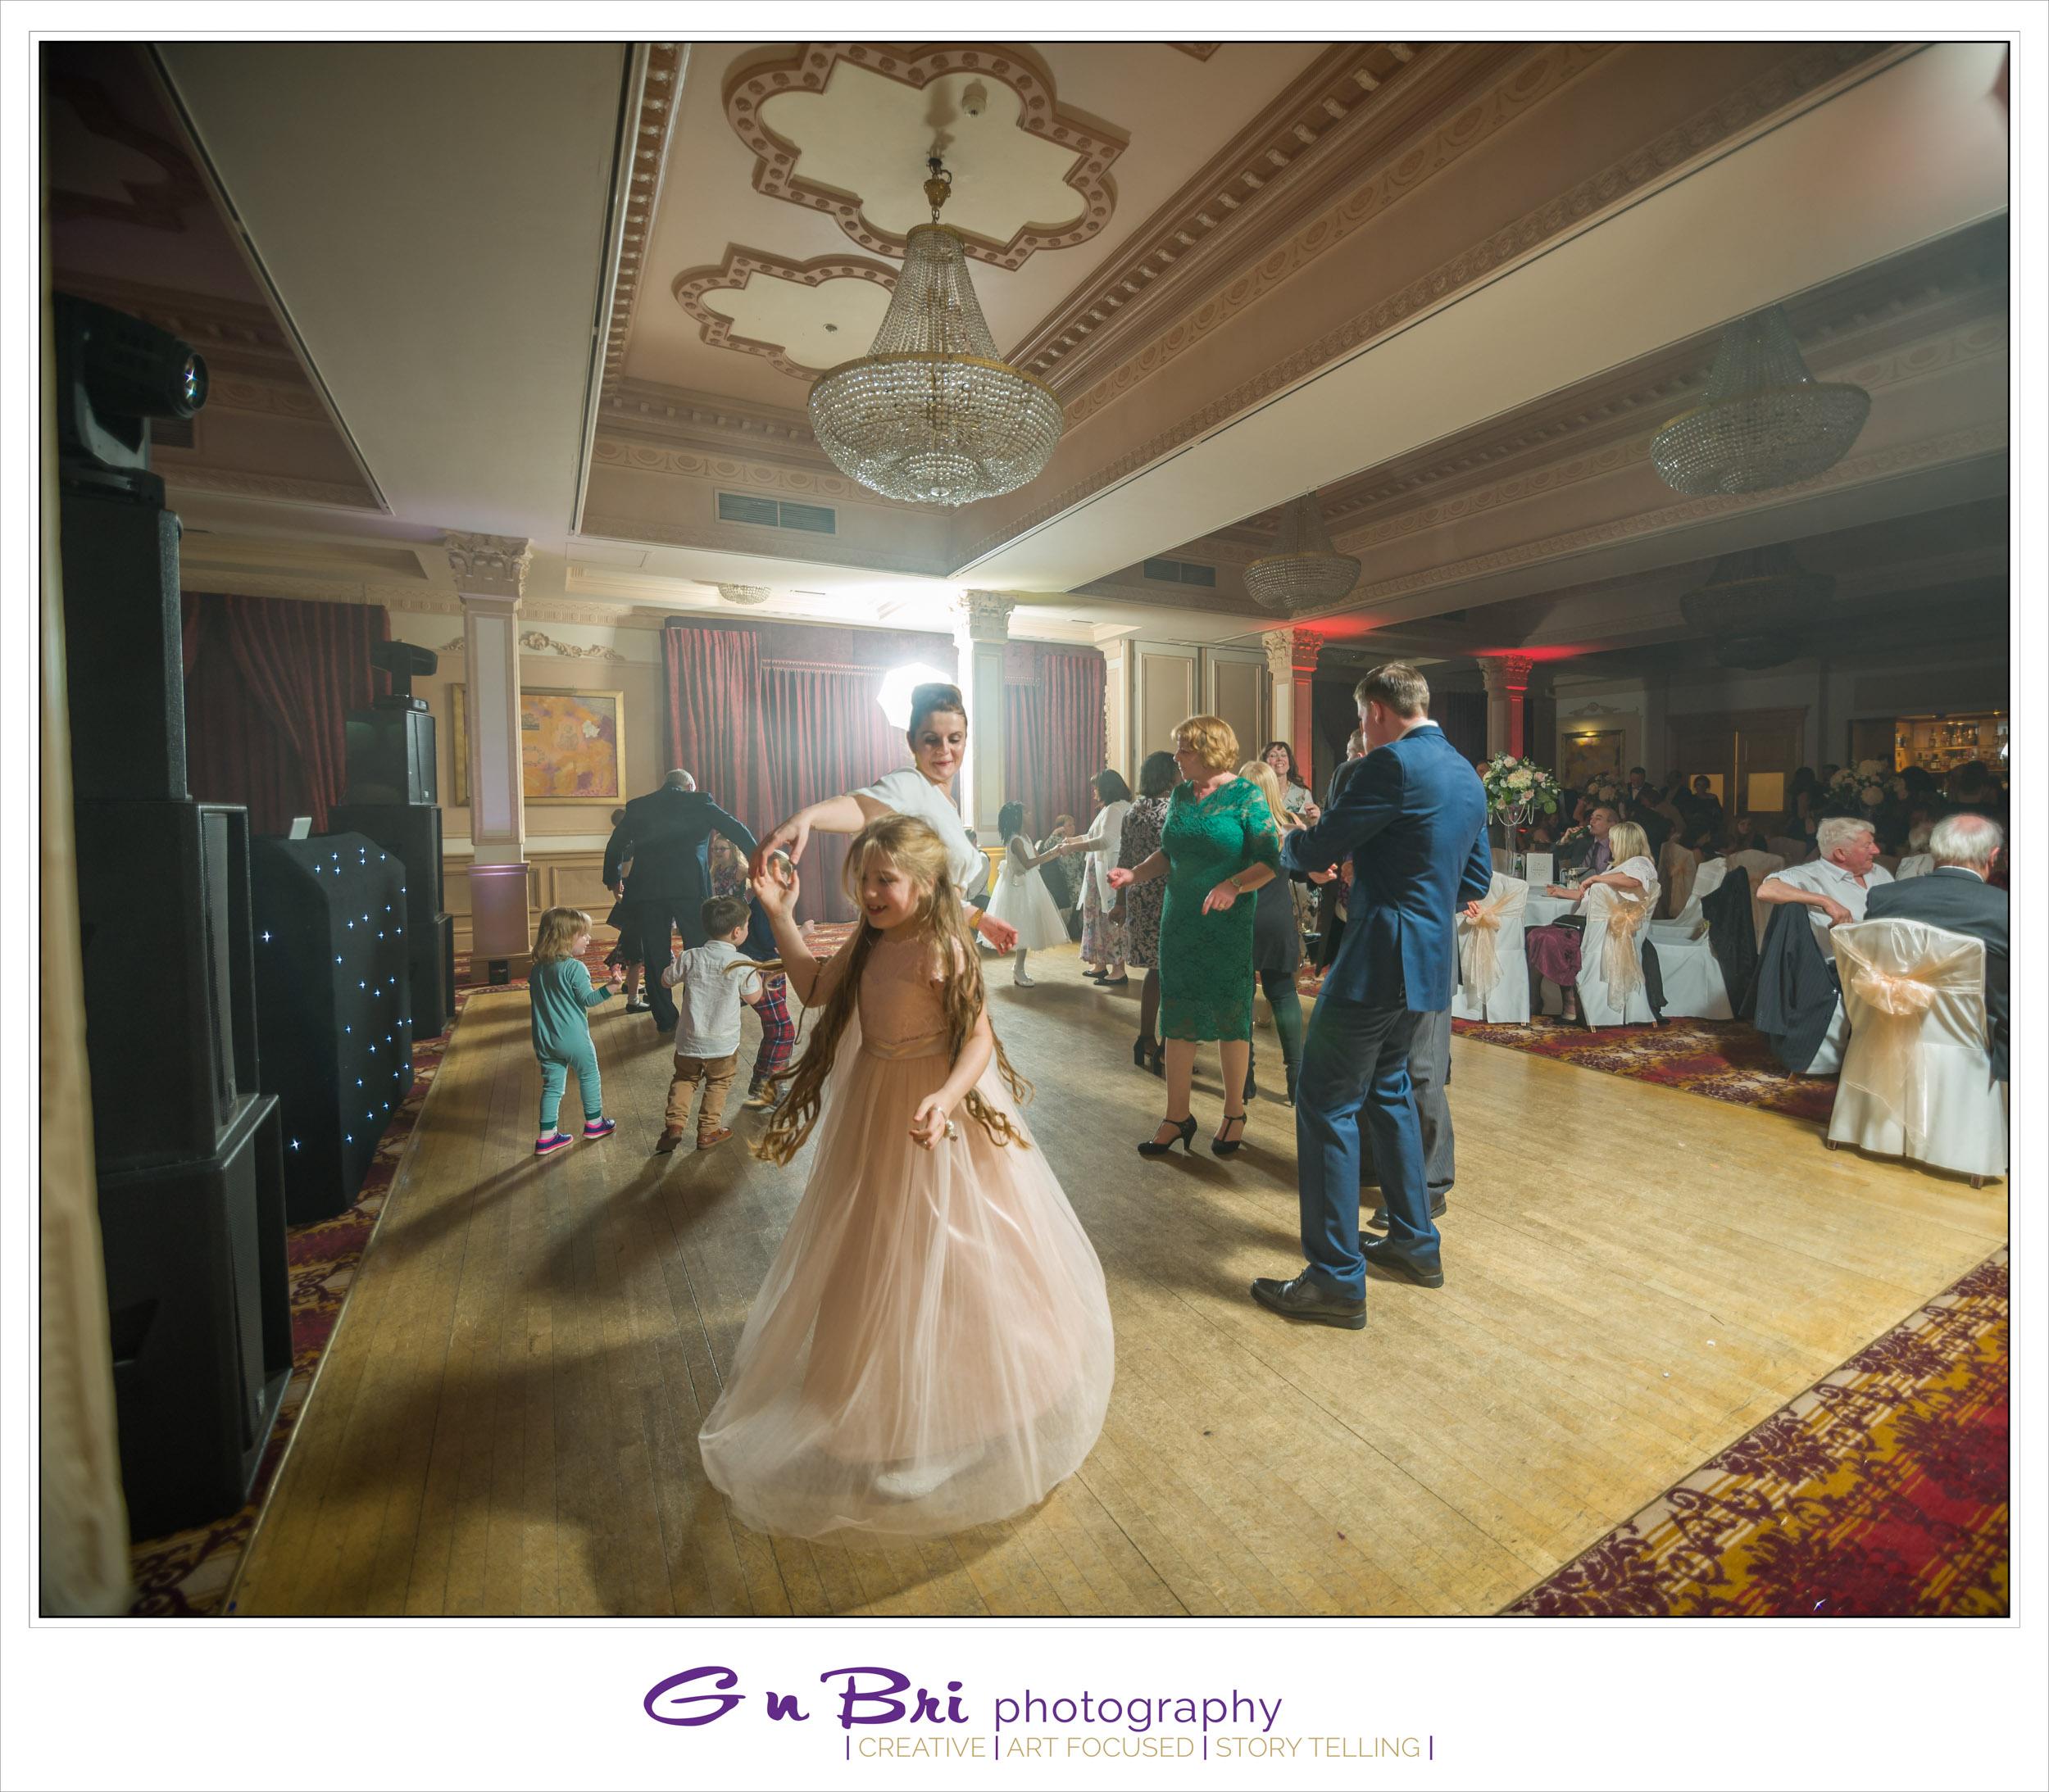 The Down Hall Dance floor.